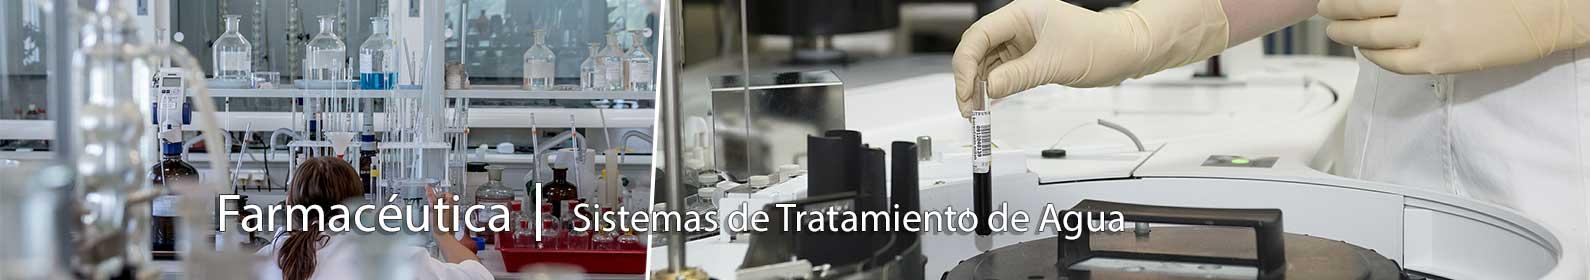 sistemas-de-tratamiento-de-agua-farmaceutica.jpg